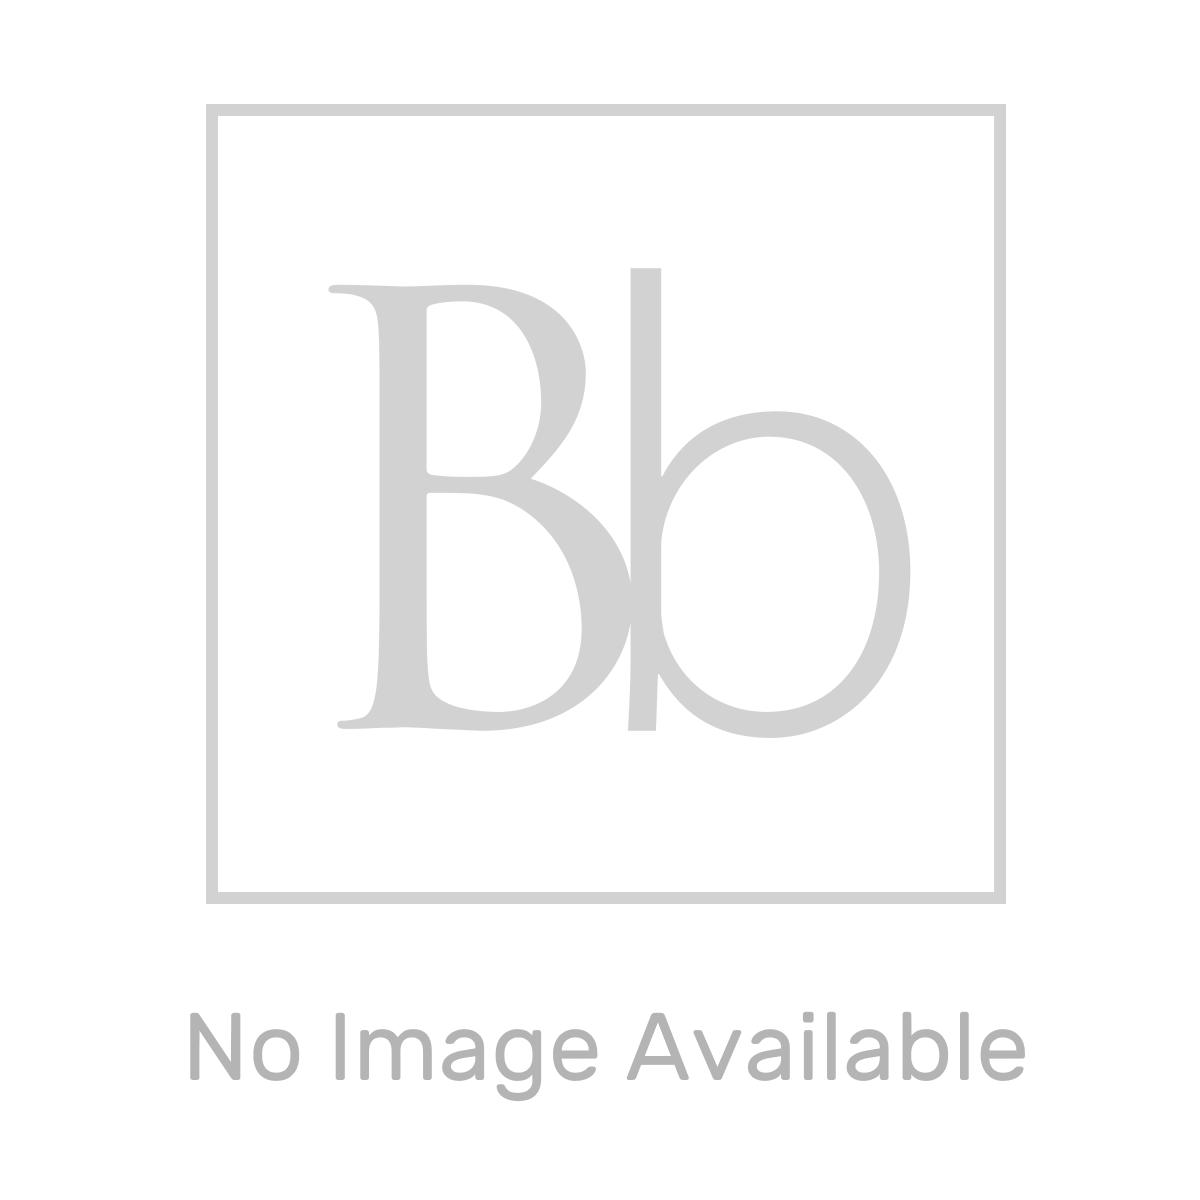 RAK Maremma Steel Matt Tile 750 x 750mm